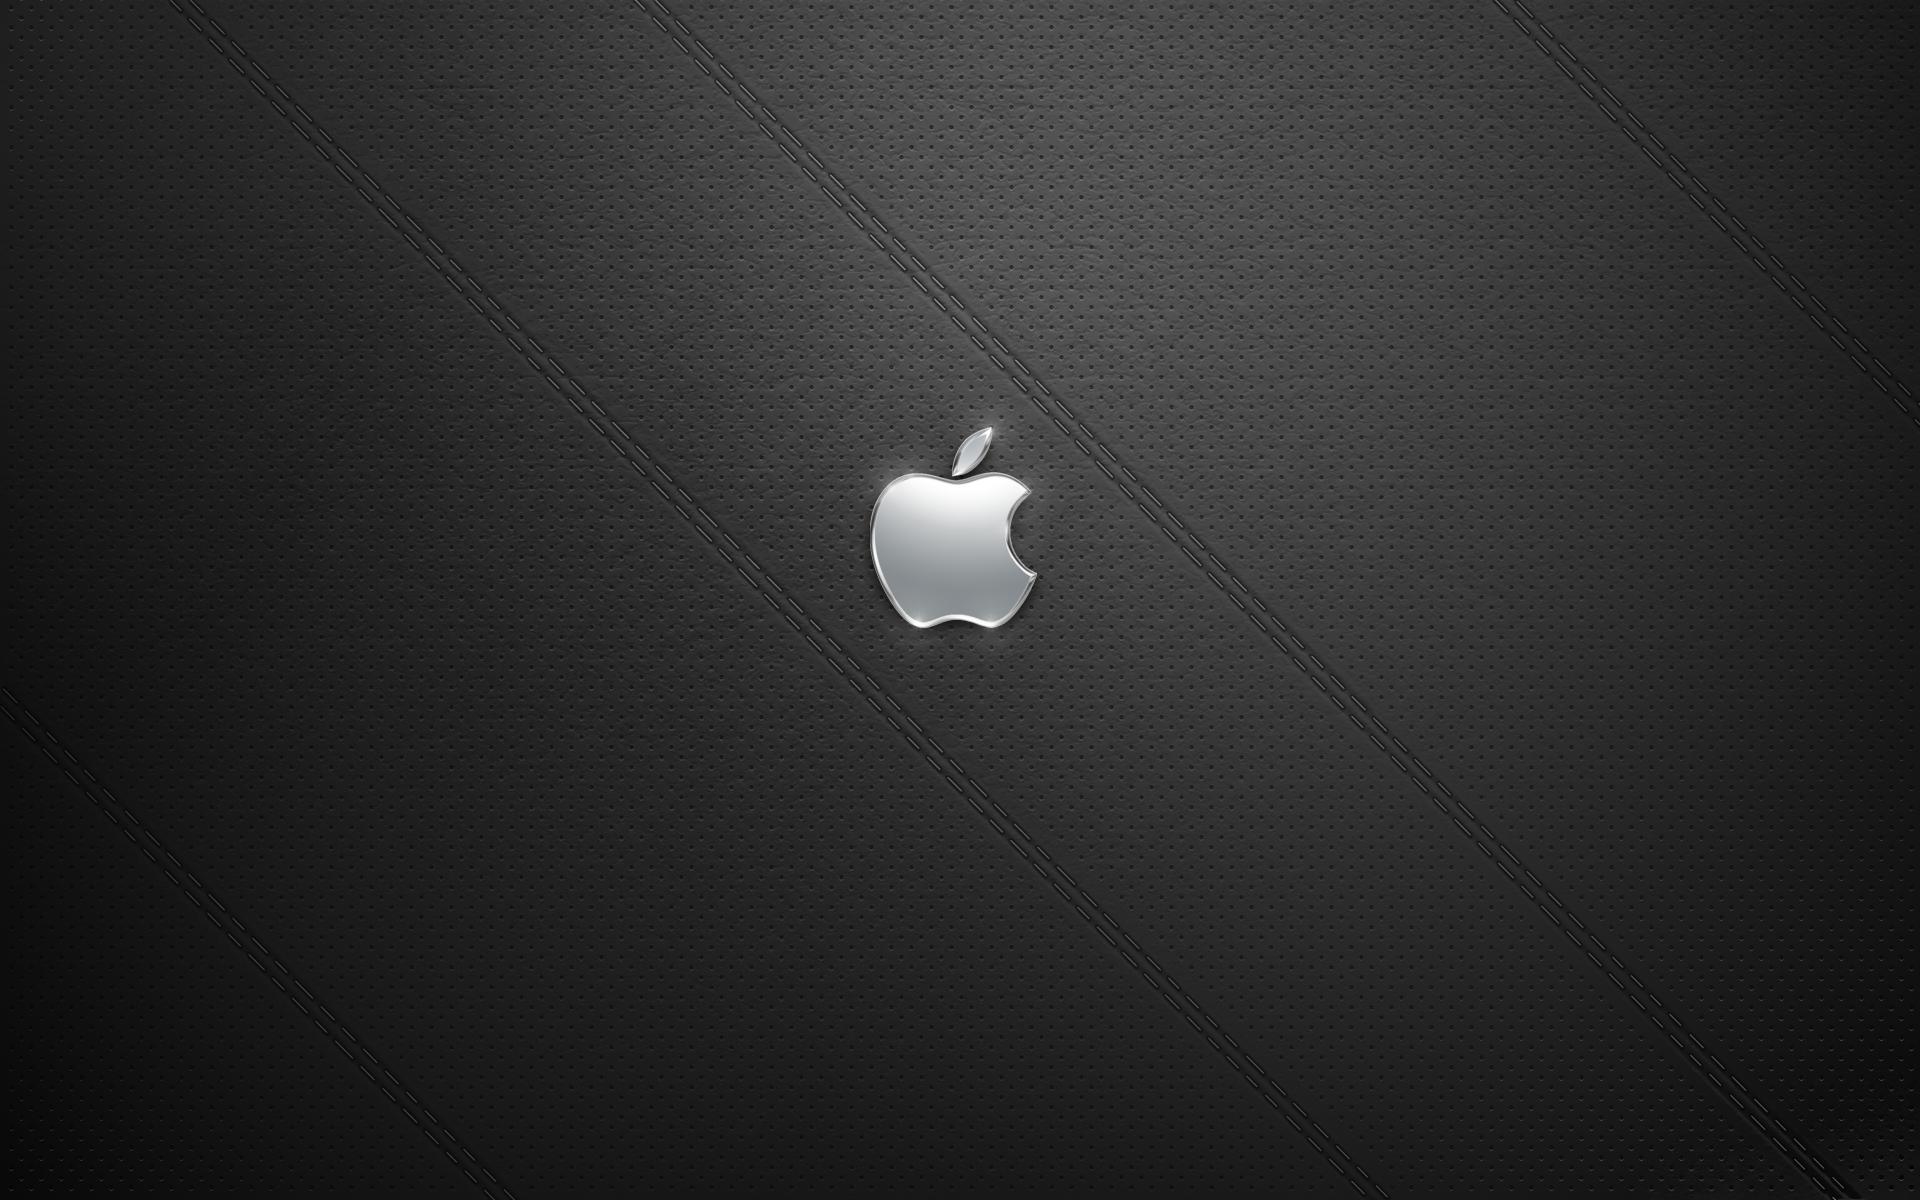 The Art of Adam Betts 187 Black Leather Apple Desktop Background 1920x1200